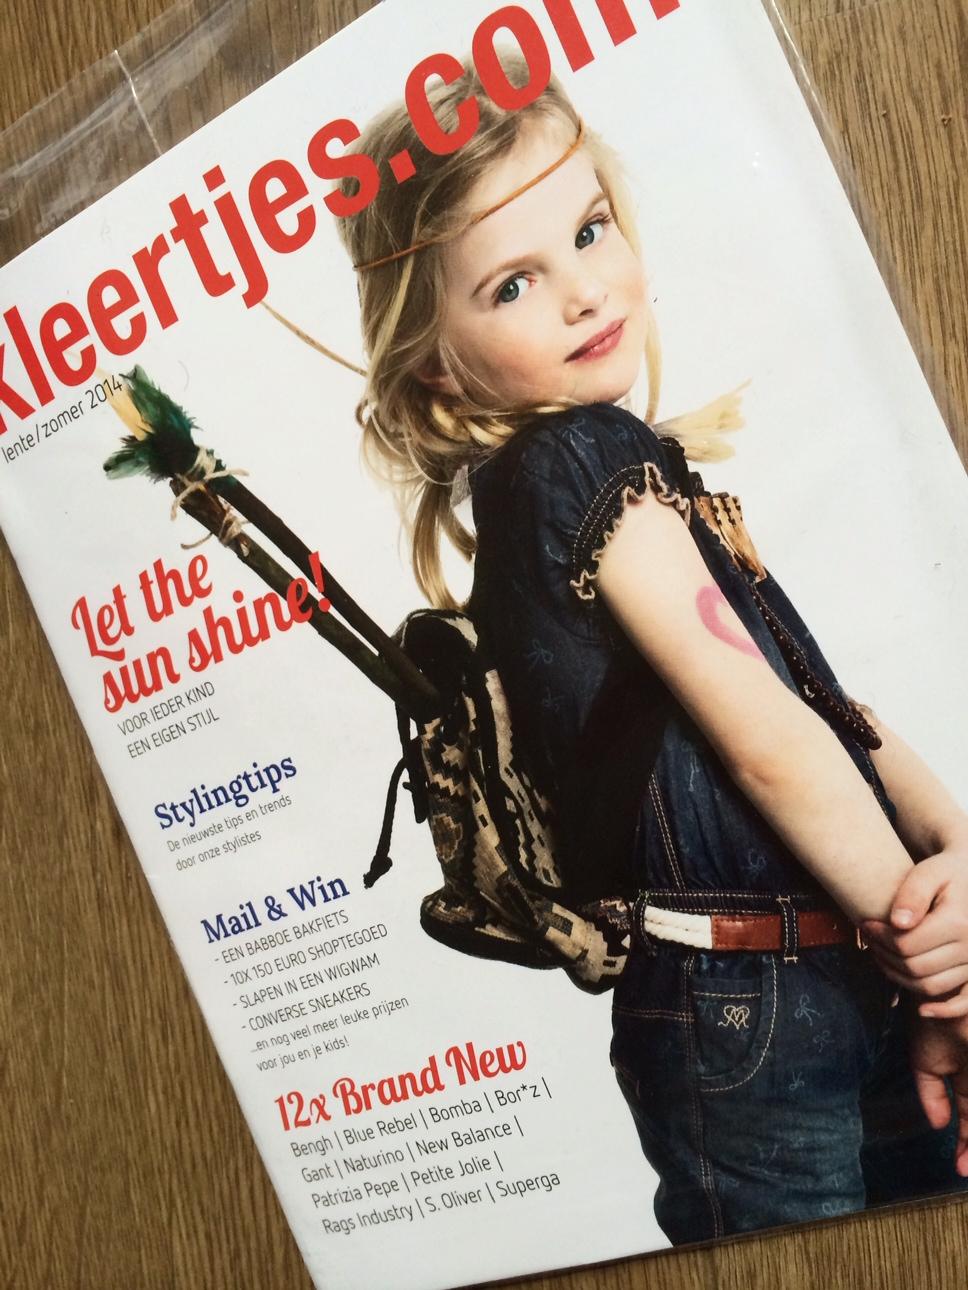 Kleertjes.com magazine